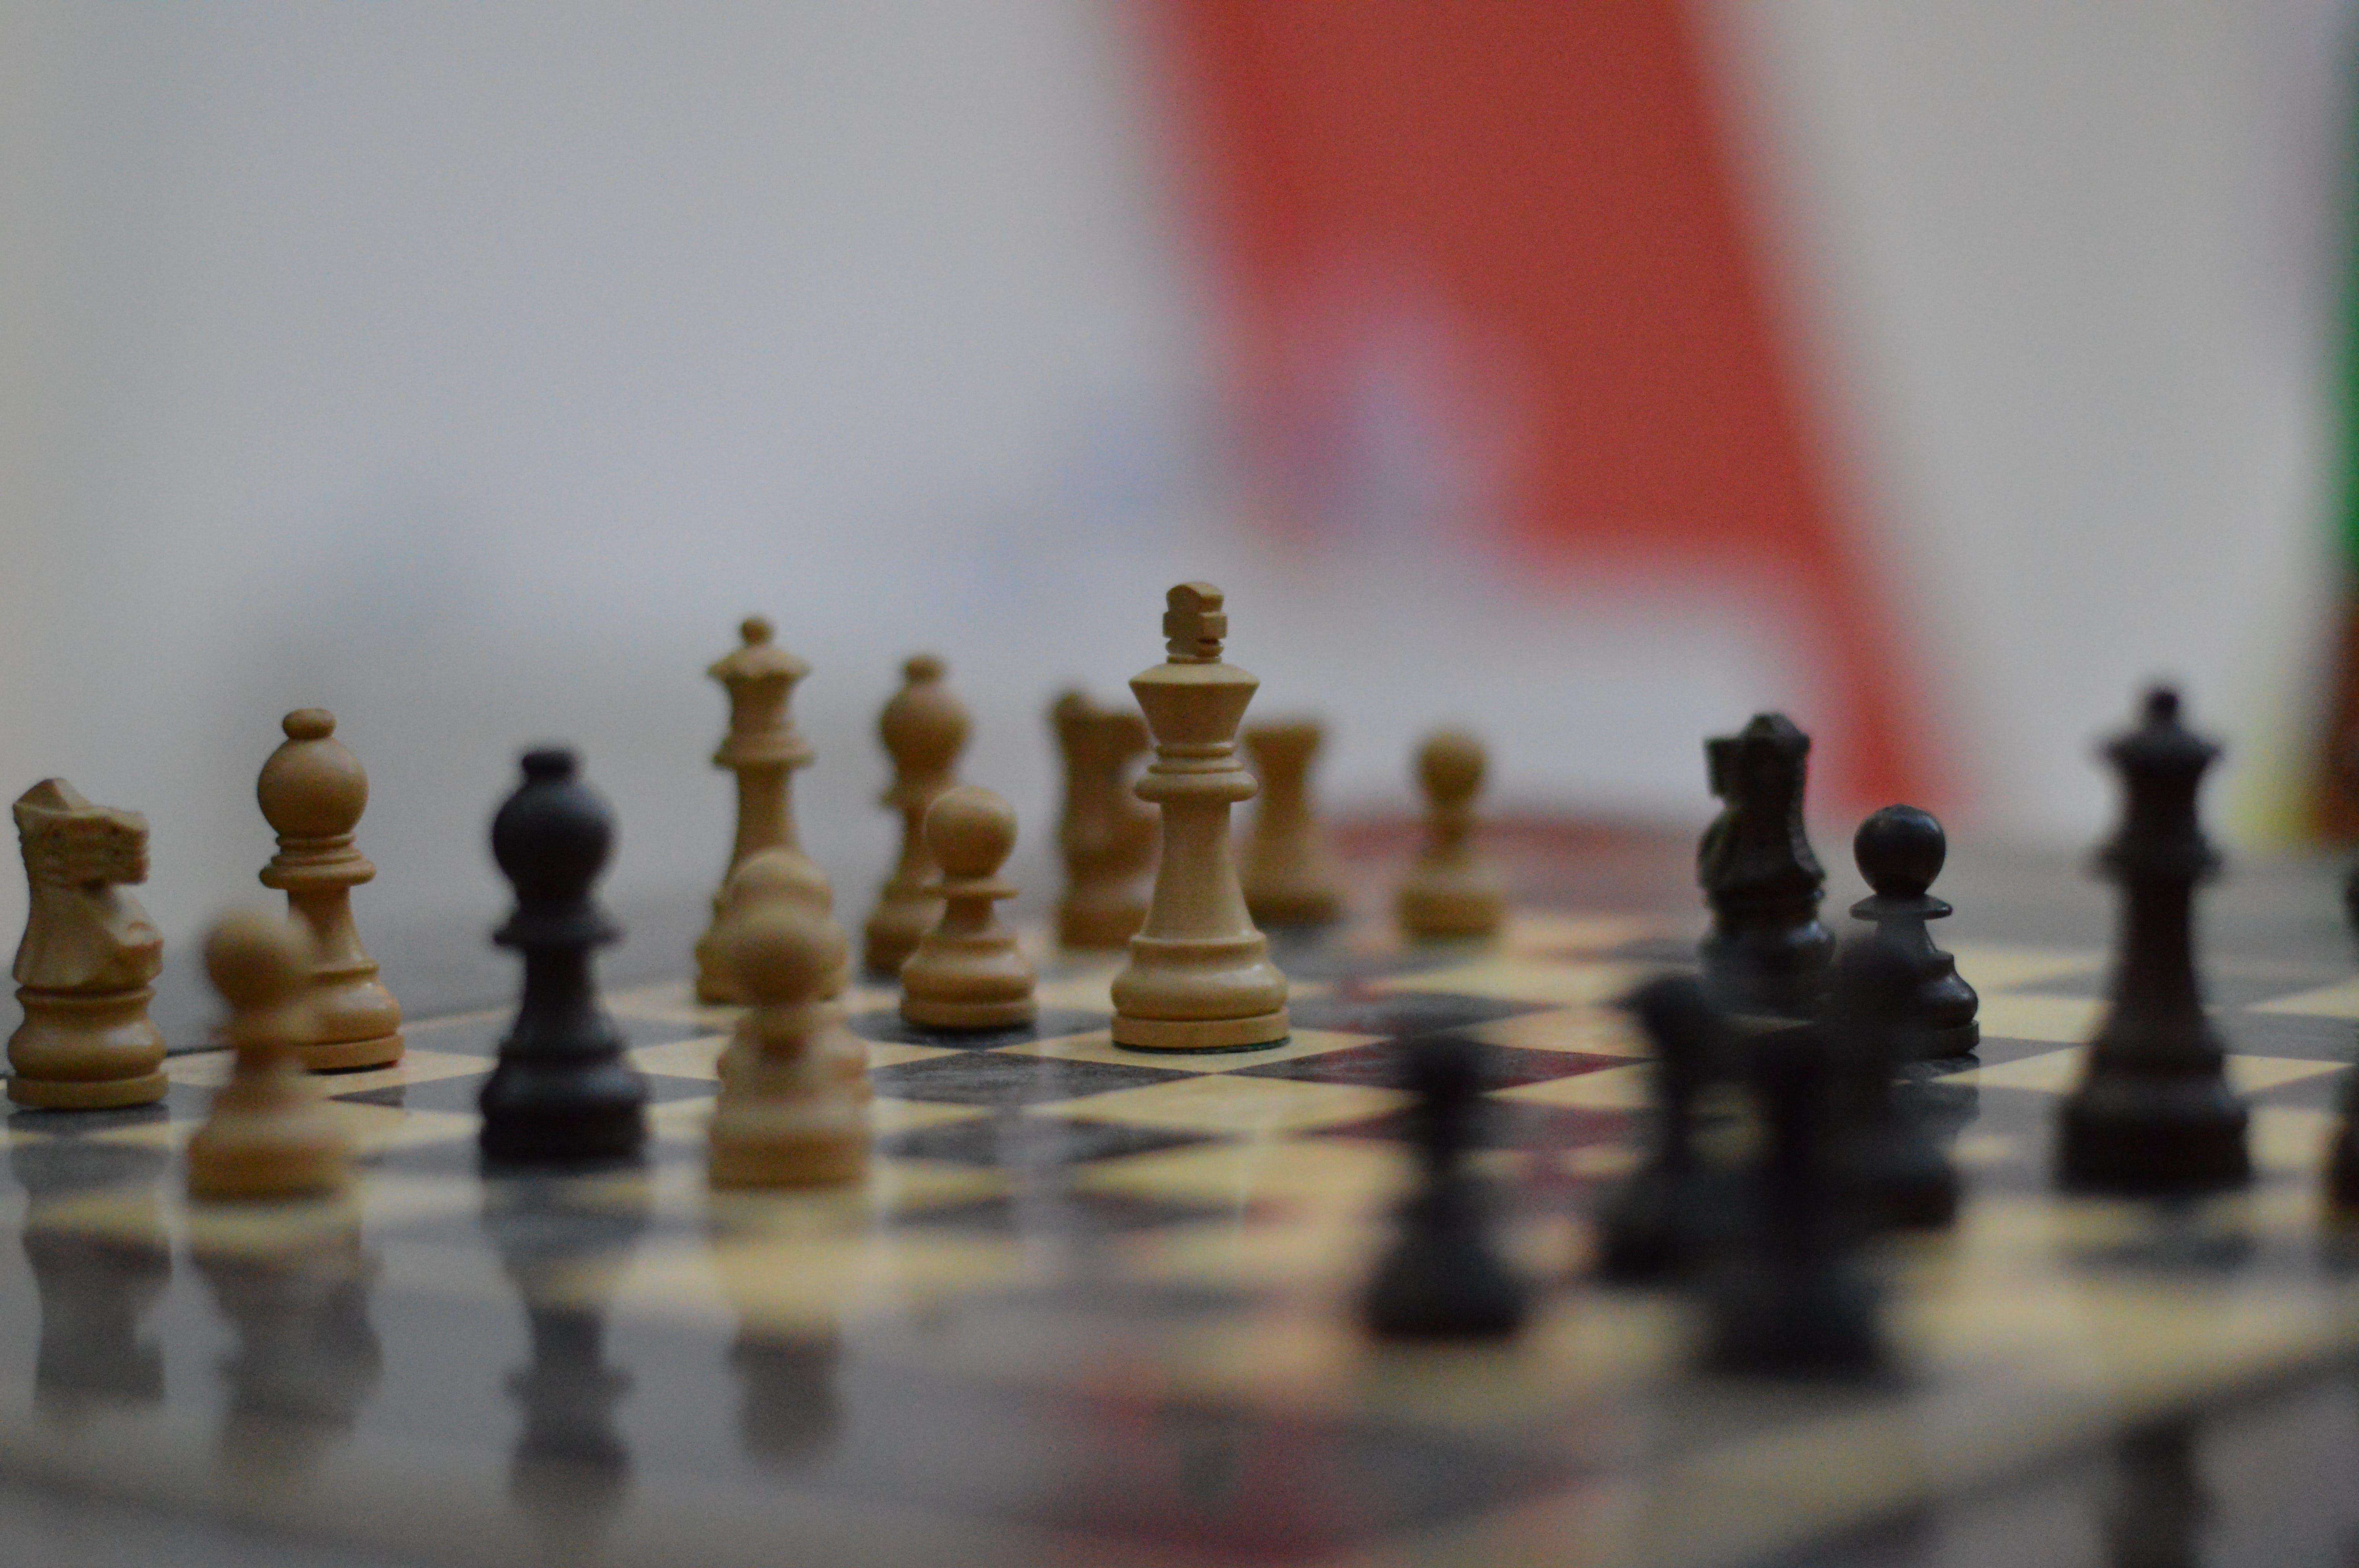 Free stock photo of #Chess #Mekarfest